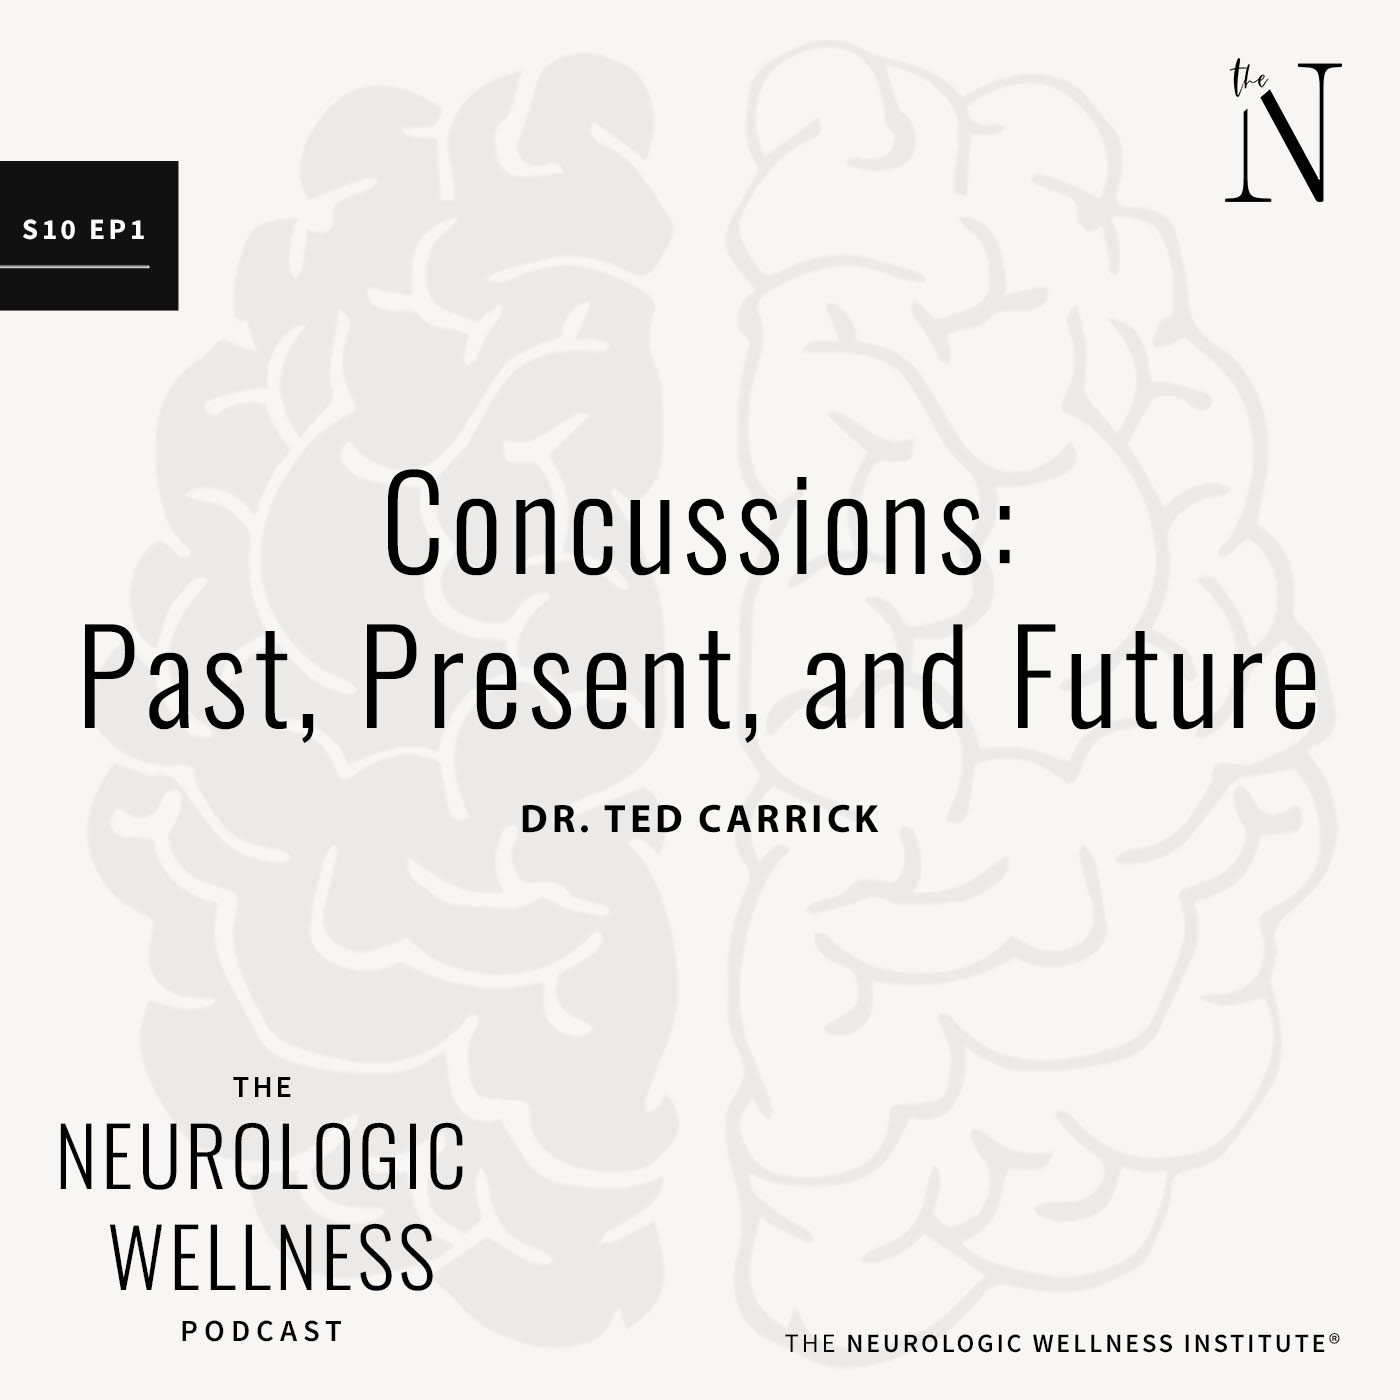 Concussions: Past, Present, and Future